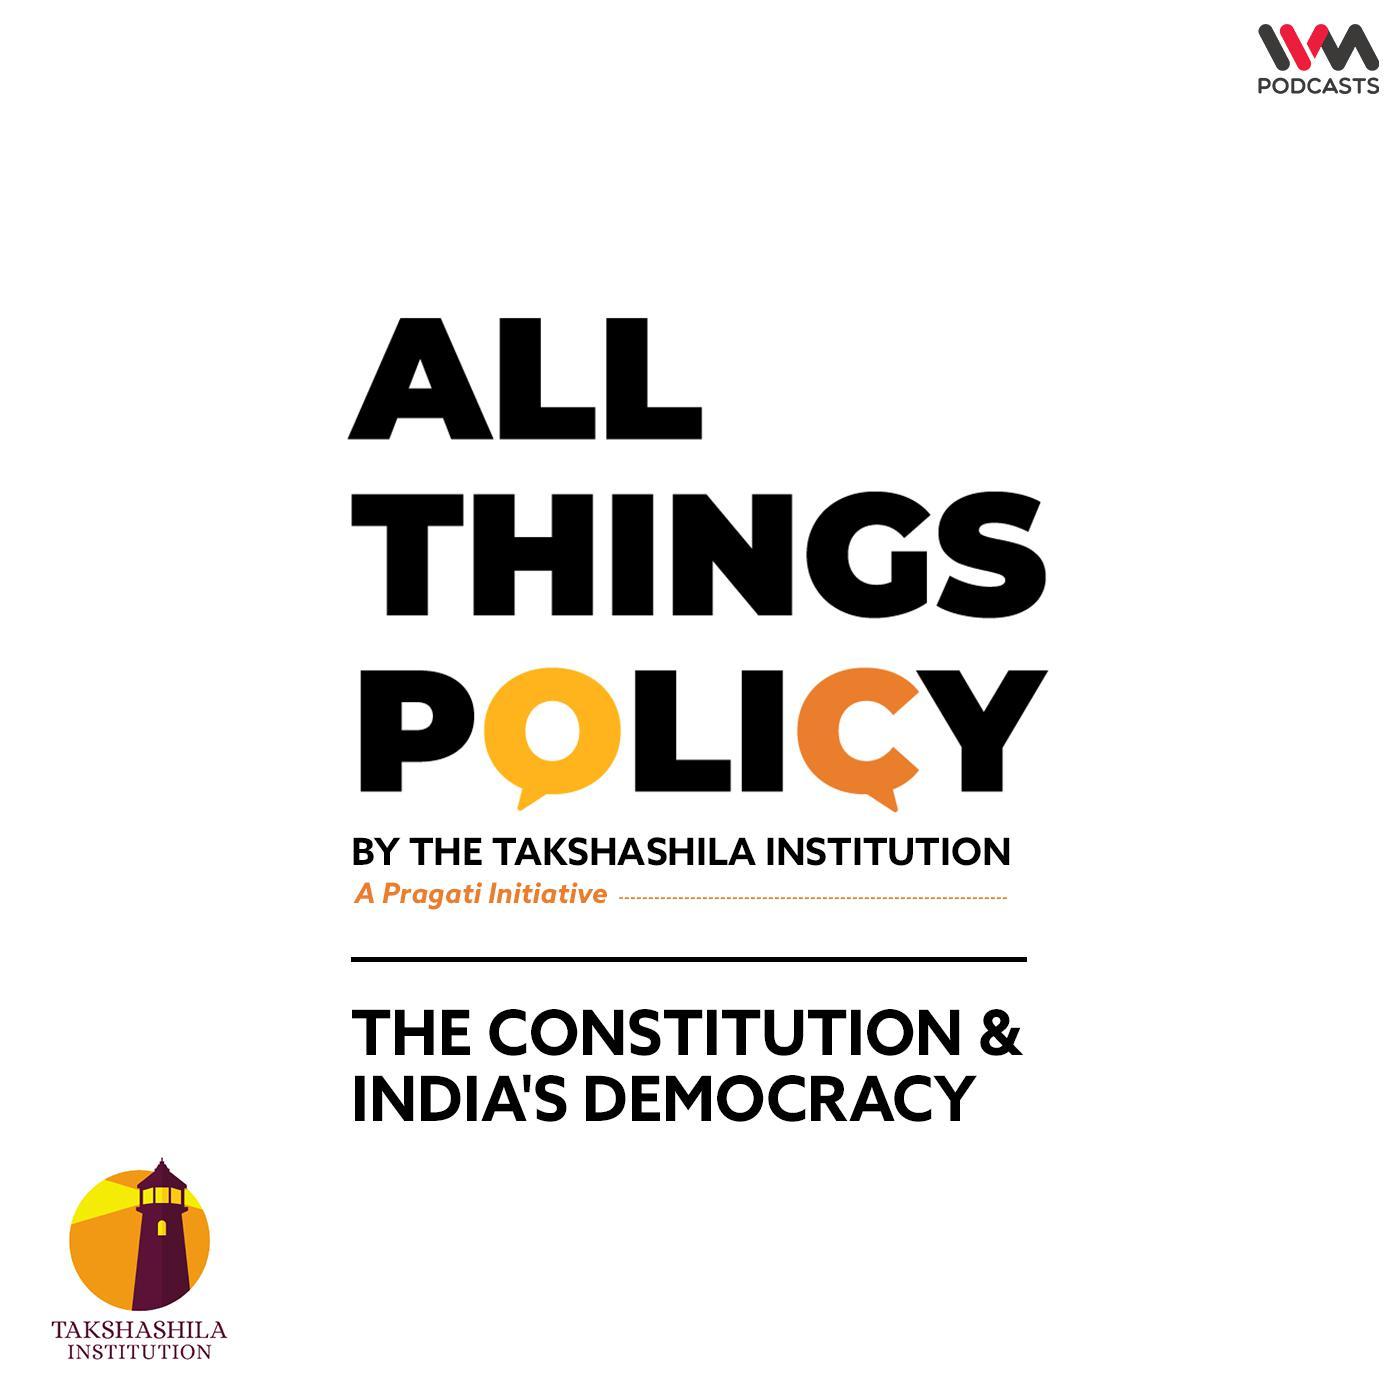 Ep. 612: The Constitution & India's Democracy